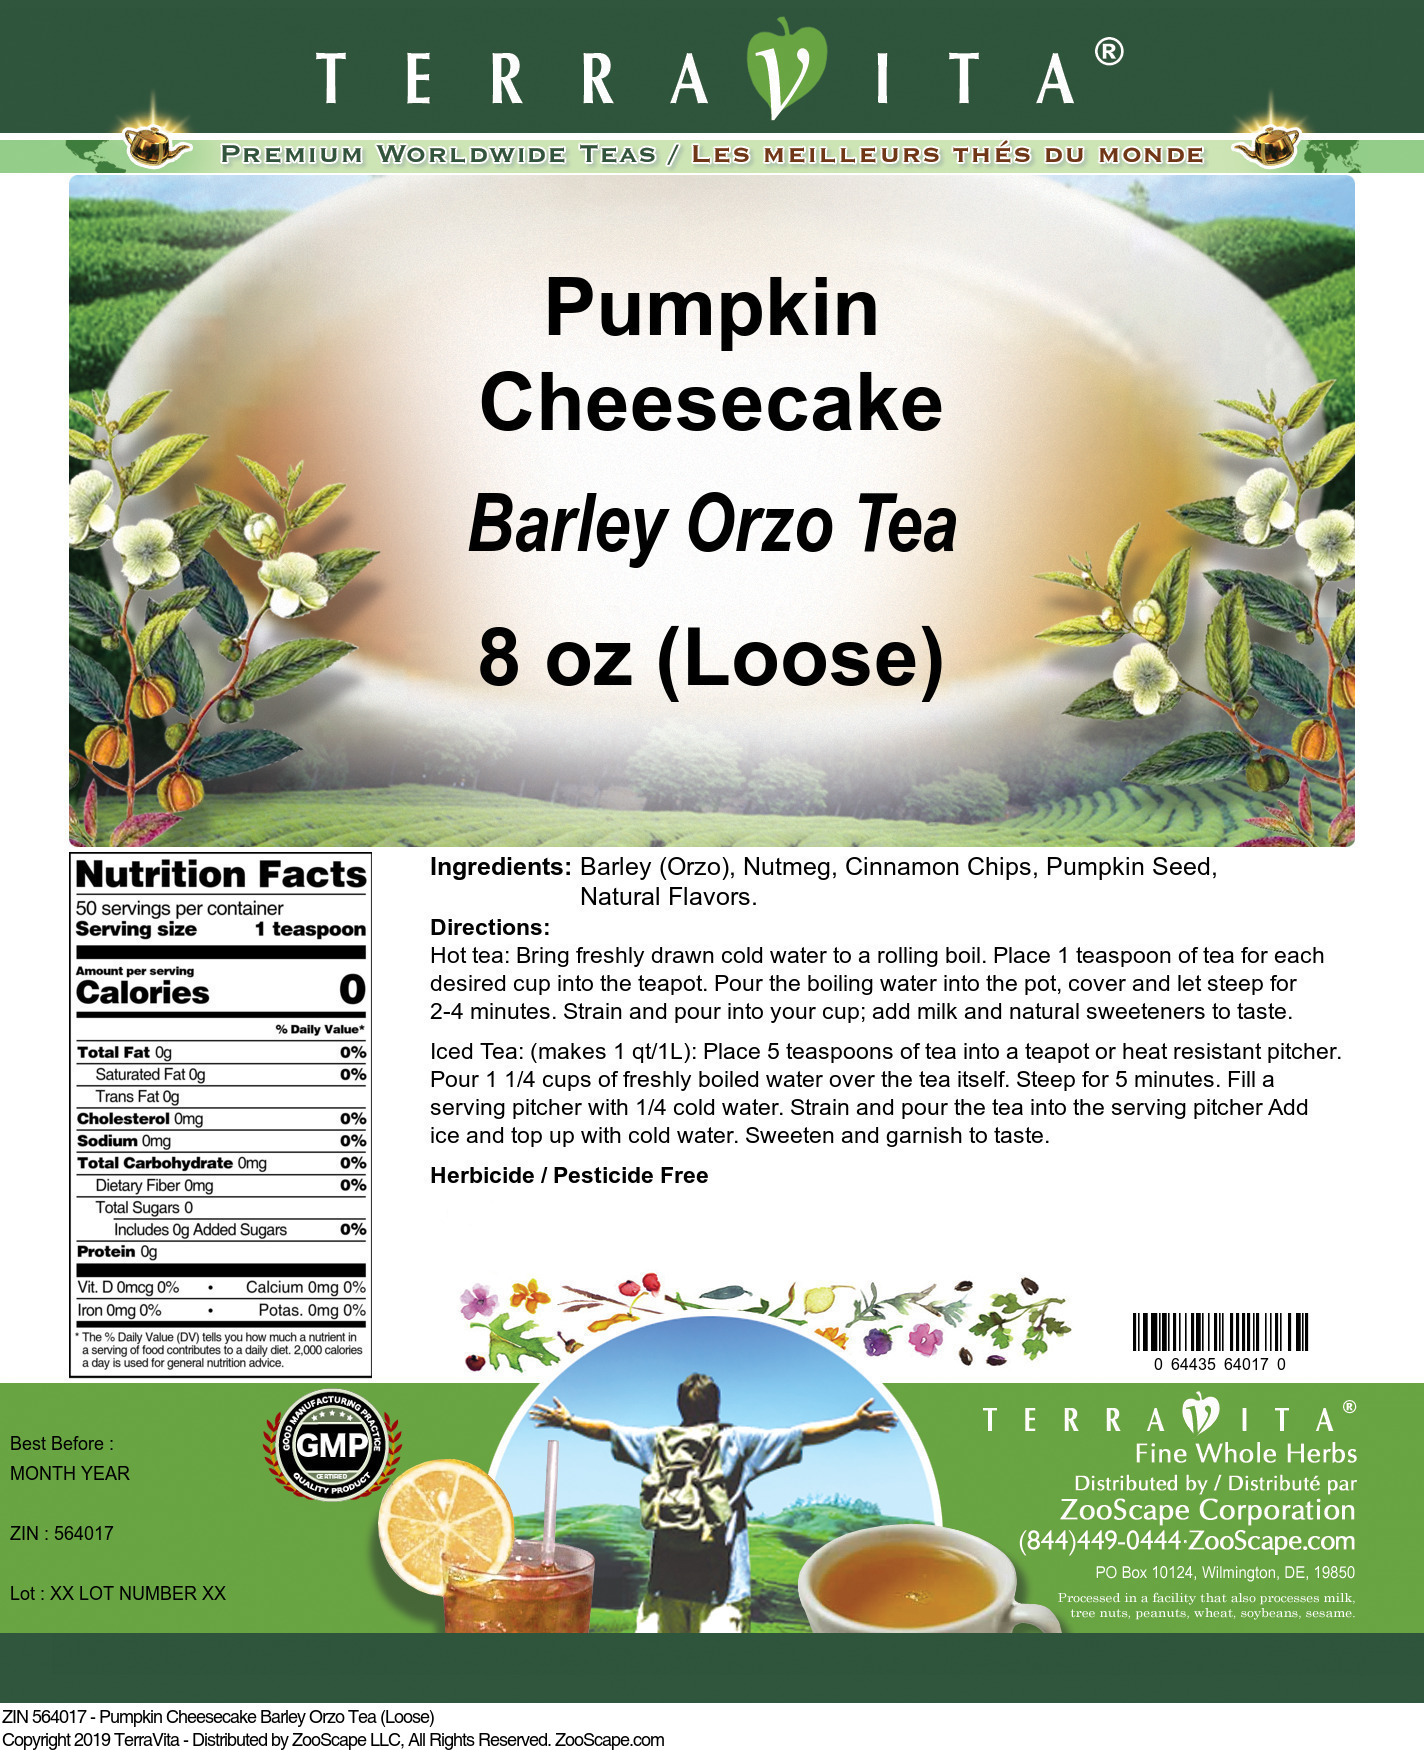 Pumpkin Cheesecake Barley Orzo